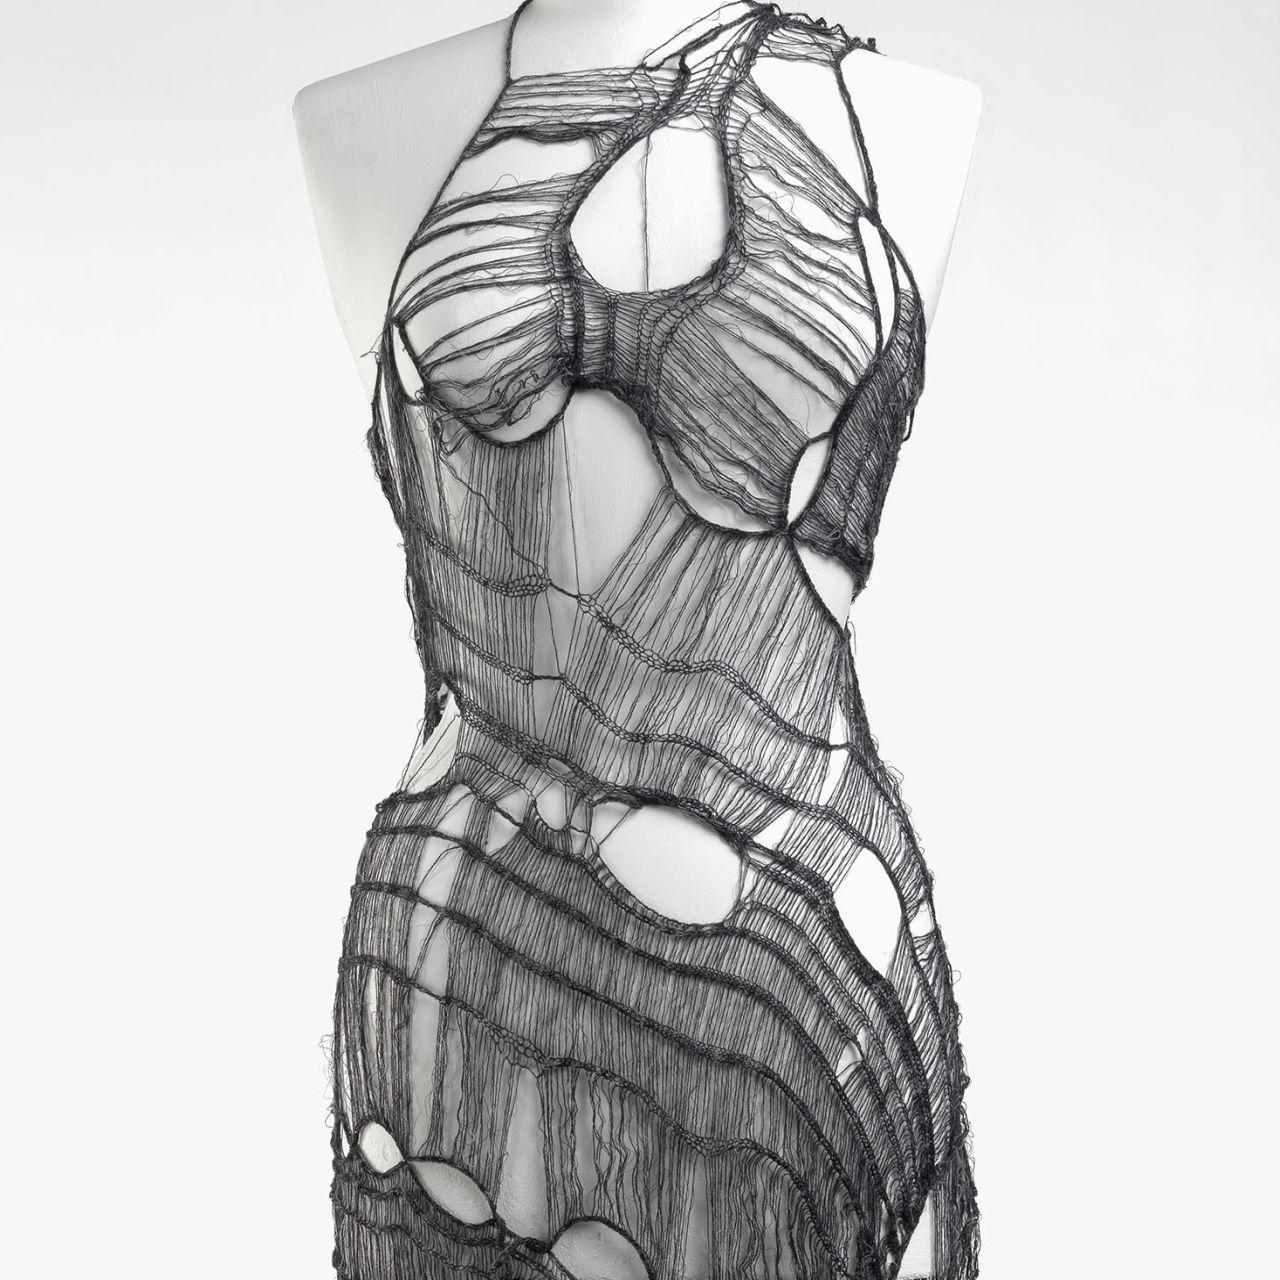 Krakas Dresses Nearly Nude 2009 Designmuseum Danmark Copenhagen Denmark 21